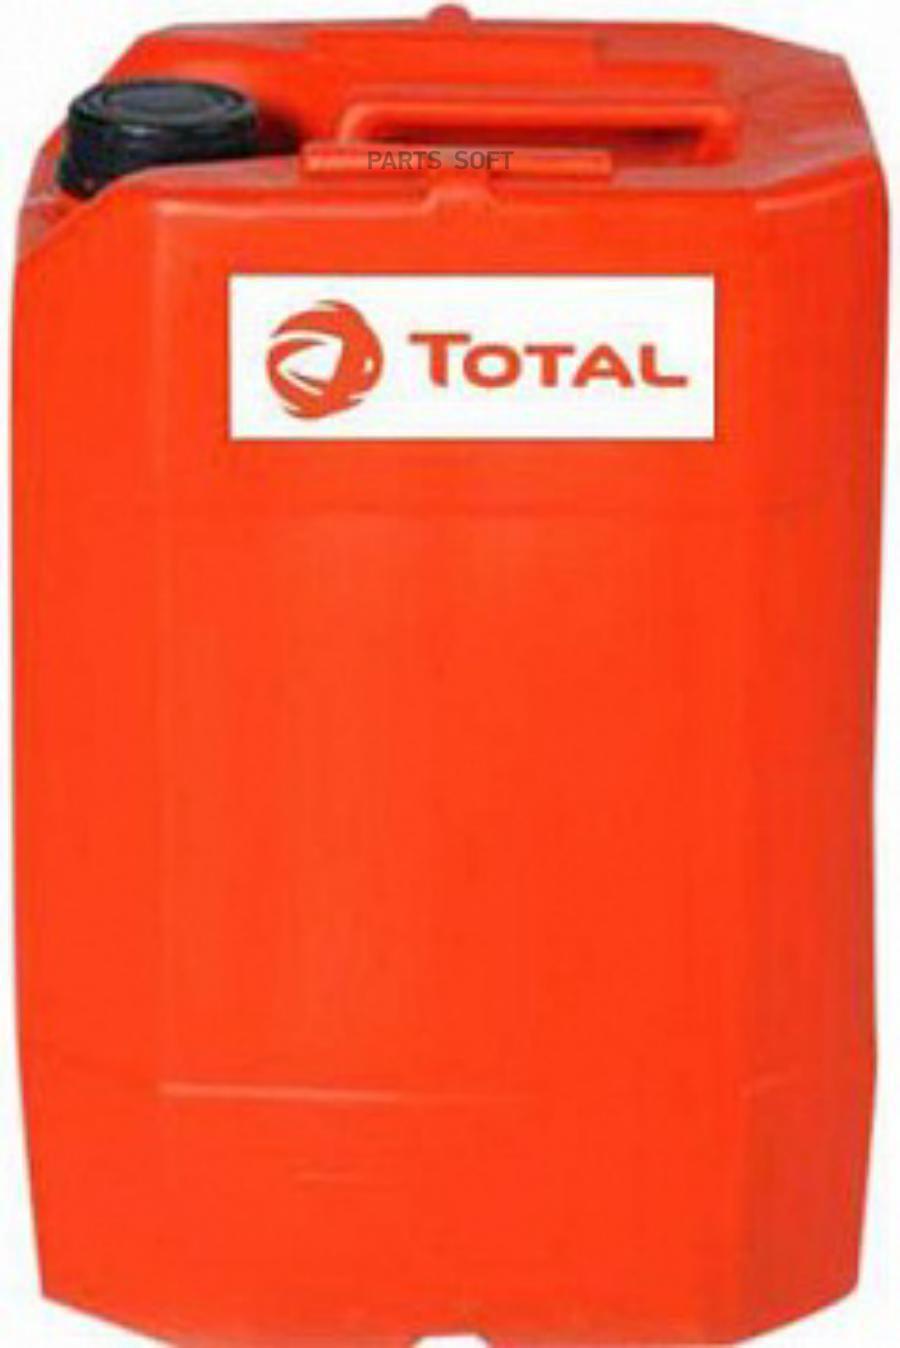 TOTAL Transmission Axle 8 FE 80W-140